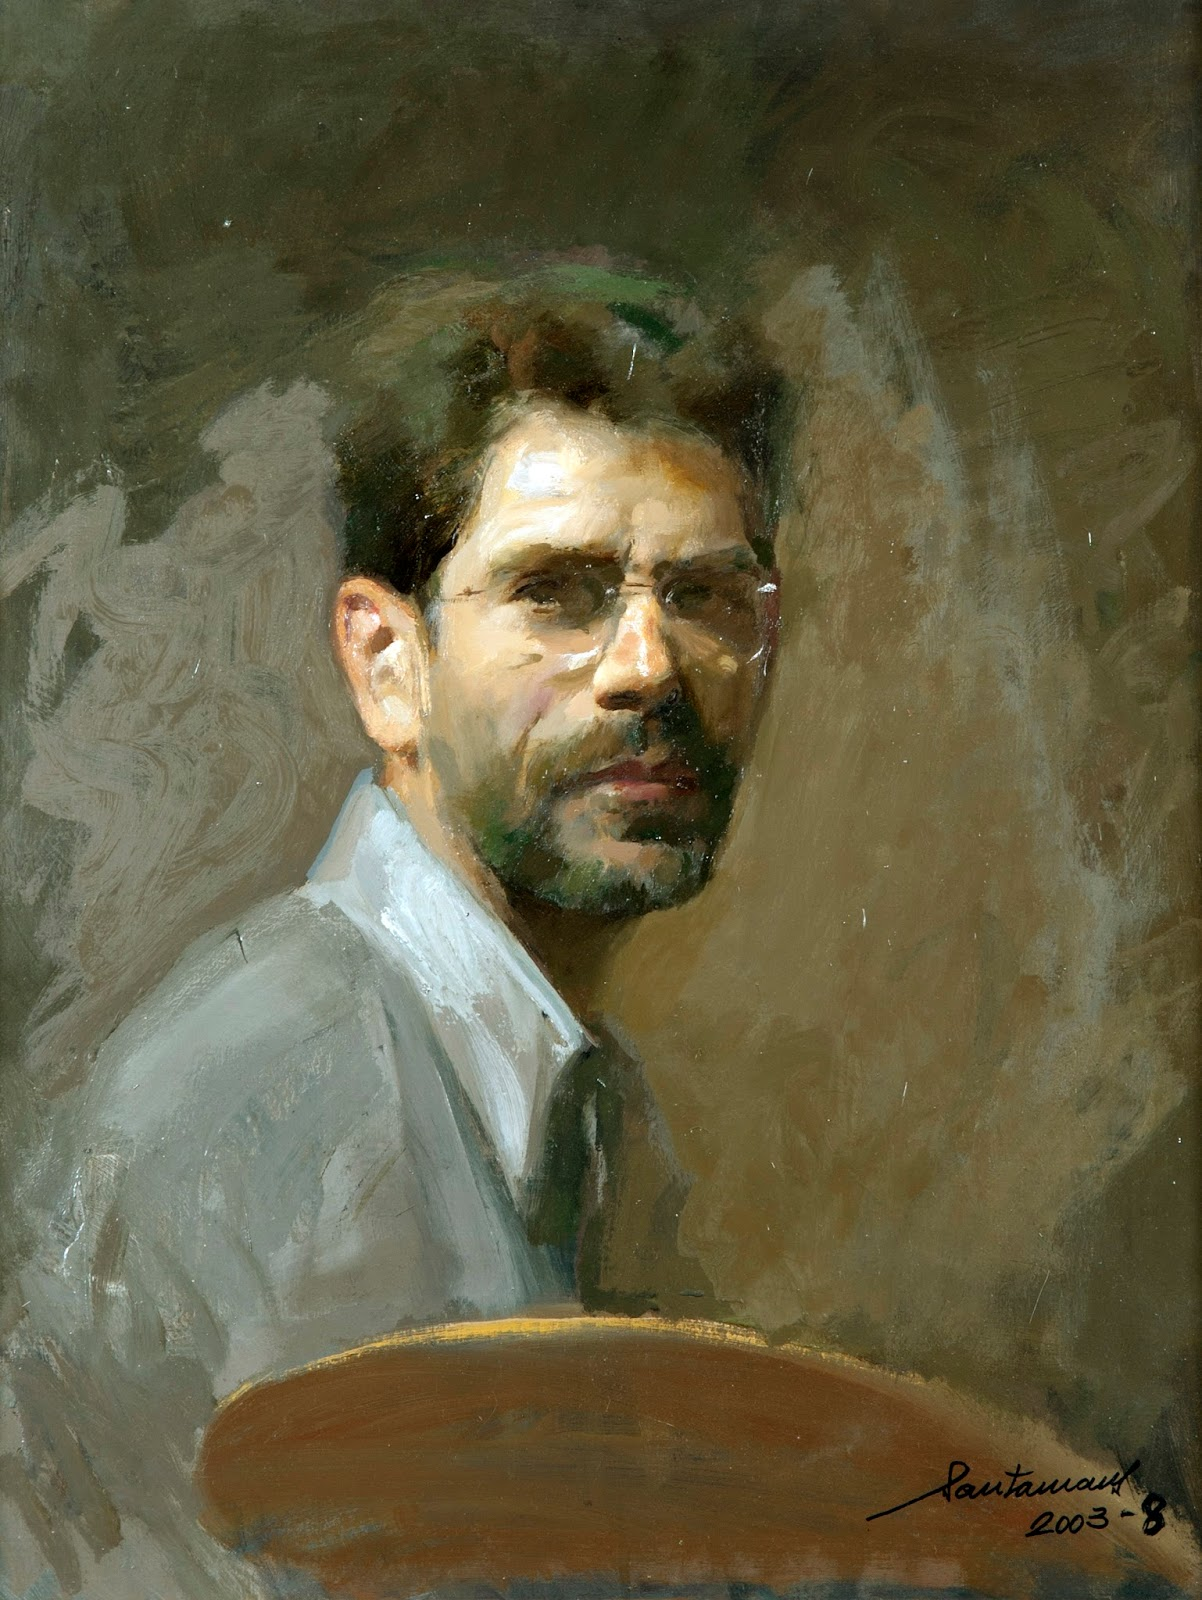 Pintores Valencianos: Felipe Santamans